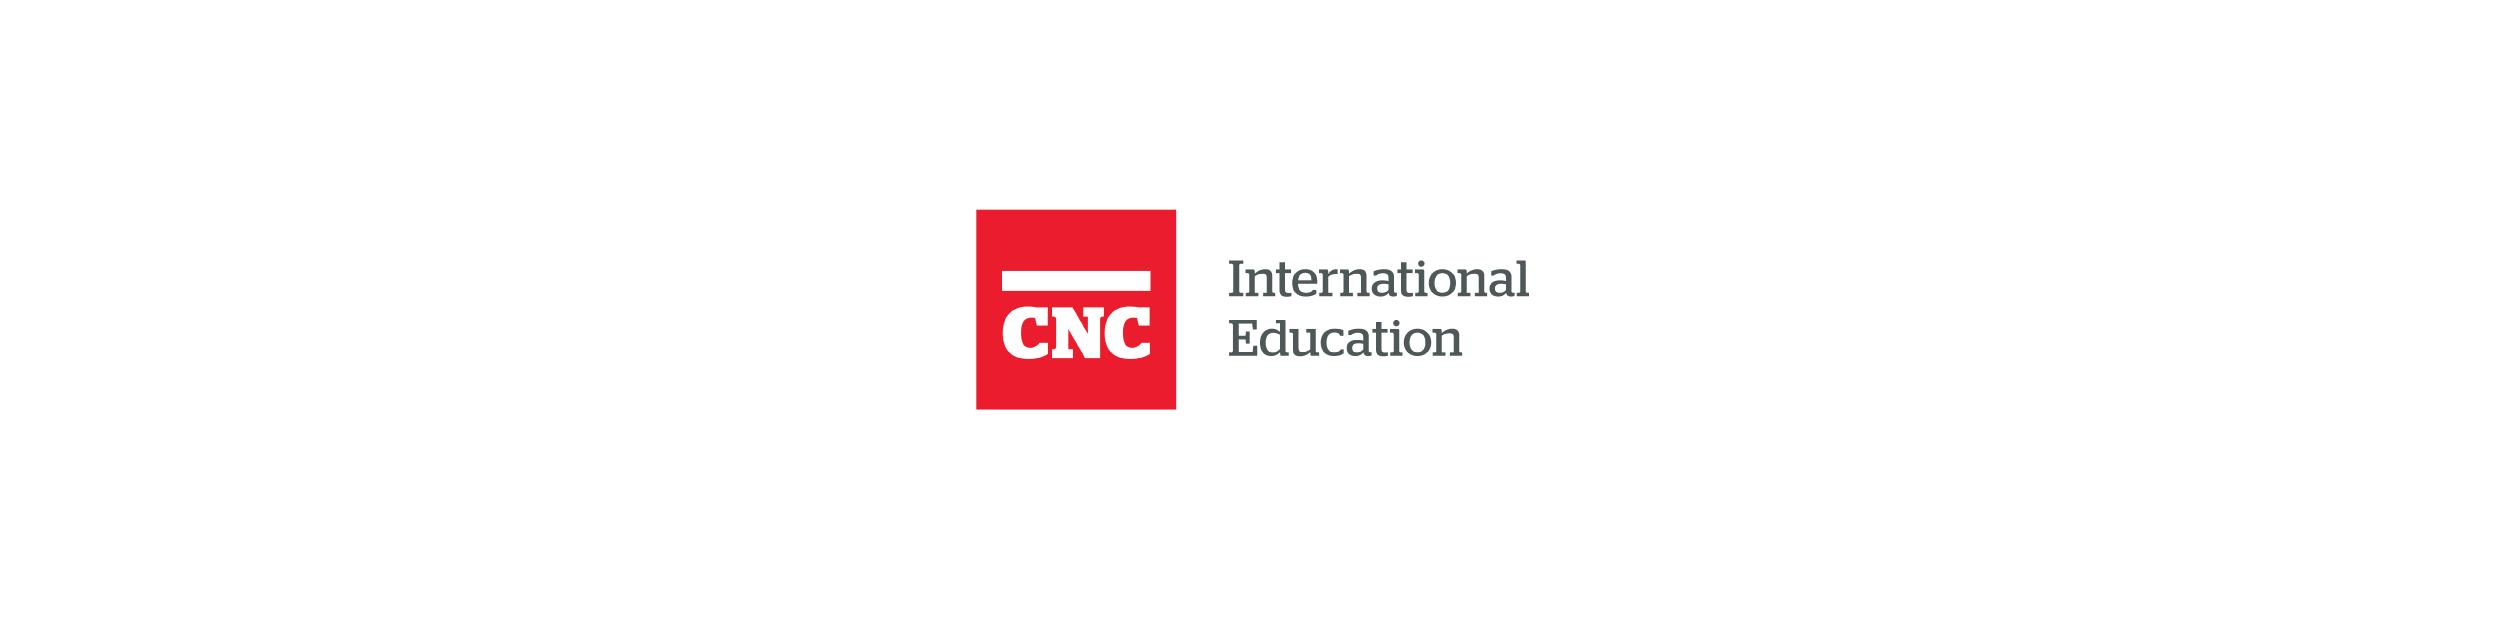 CNC-intedu